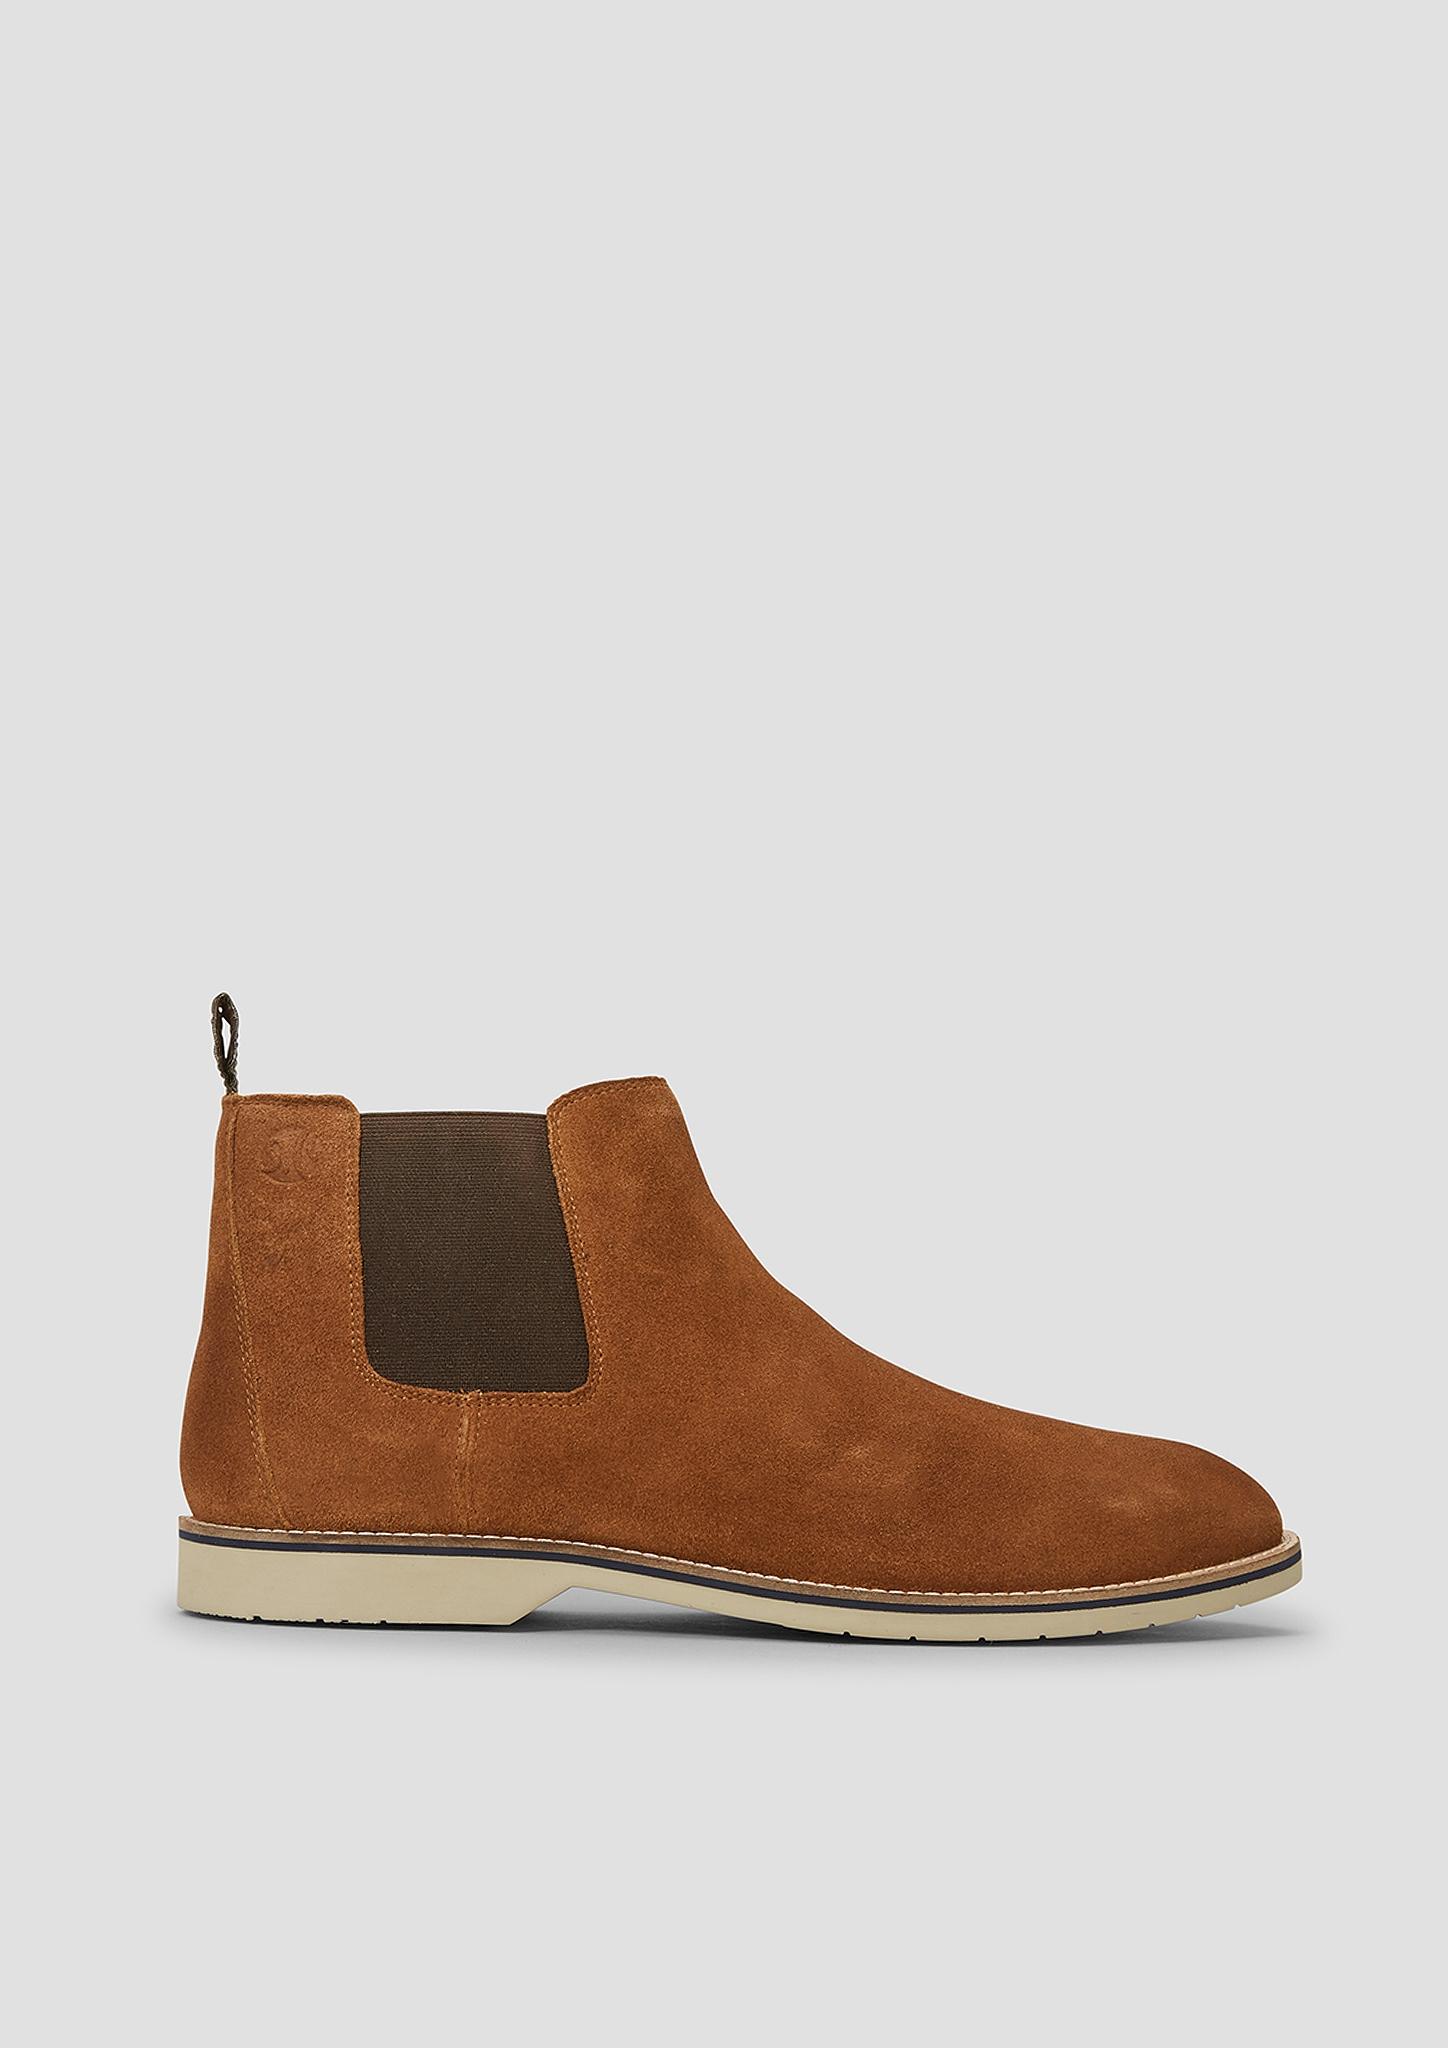 Stiefel | Schuhe > Boots | Braun | Obermaterial: leder| futter: materialmix aus leder und textil| decksohle: materialmix aus leder und textil| laufsohle: synthetik | s.Oliver